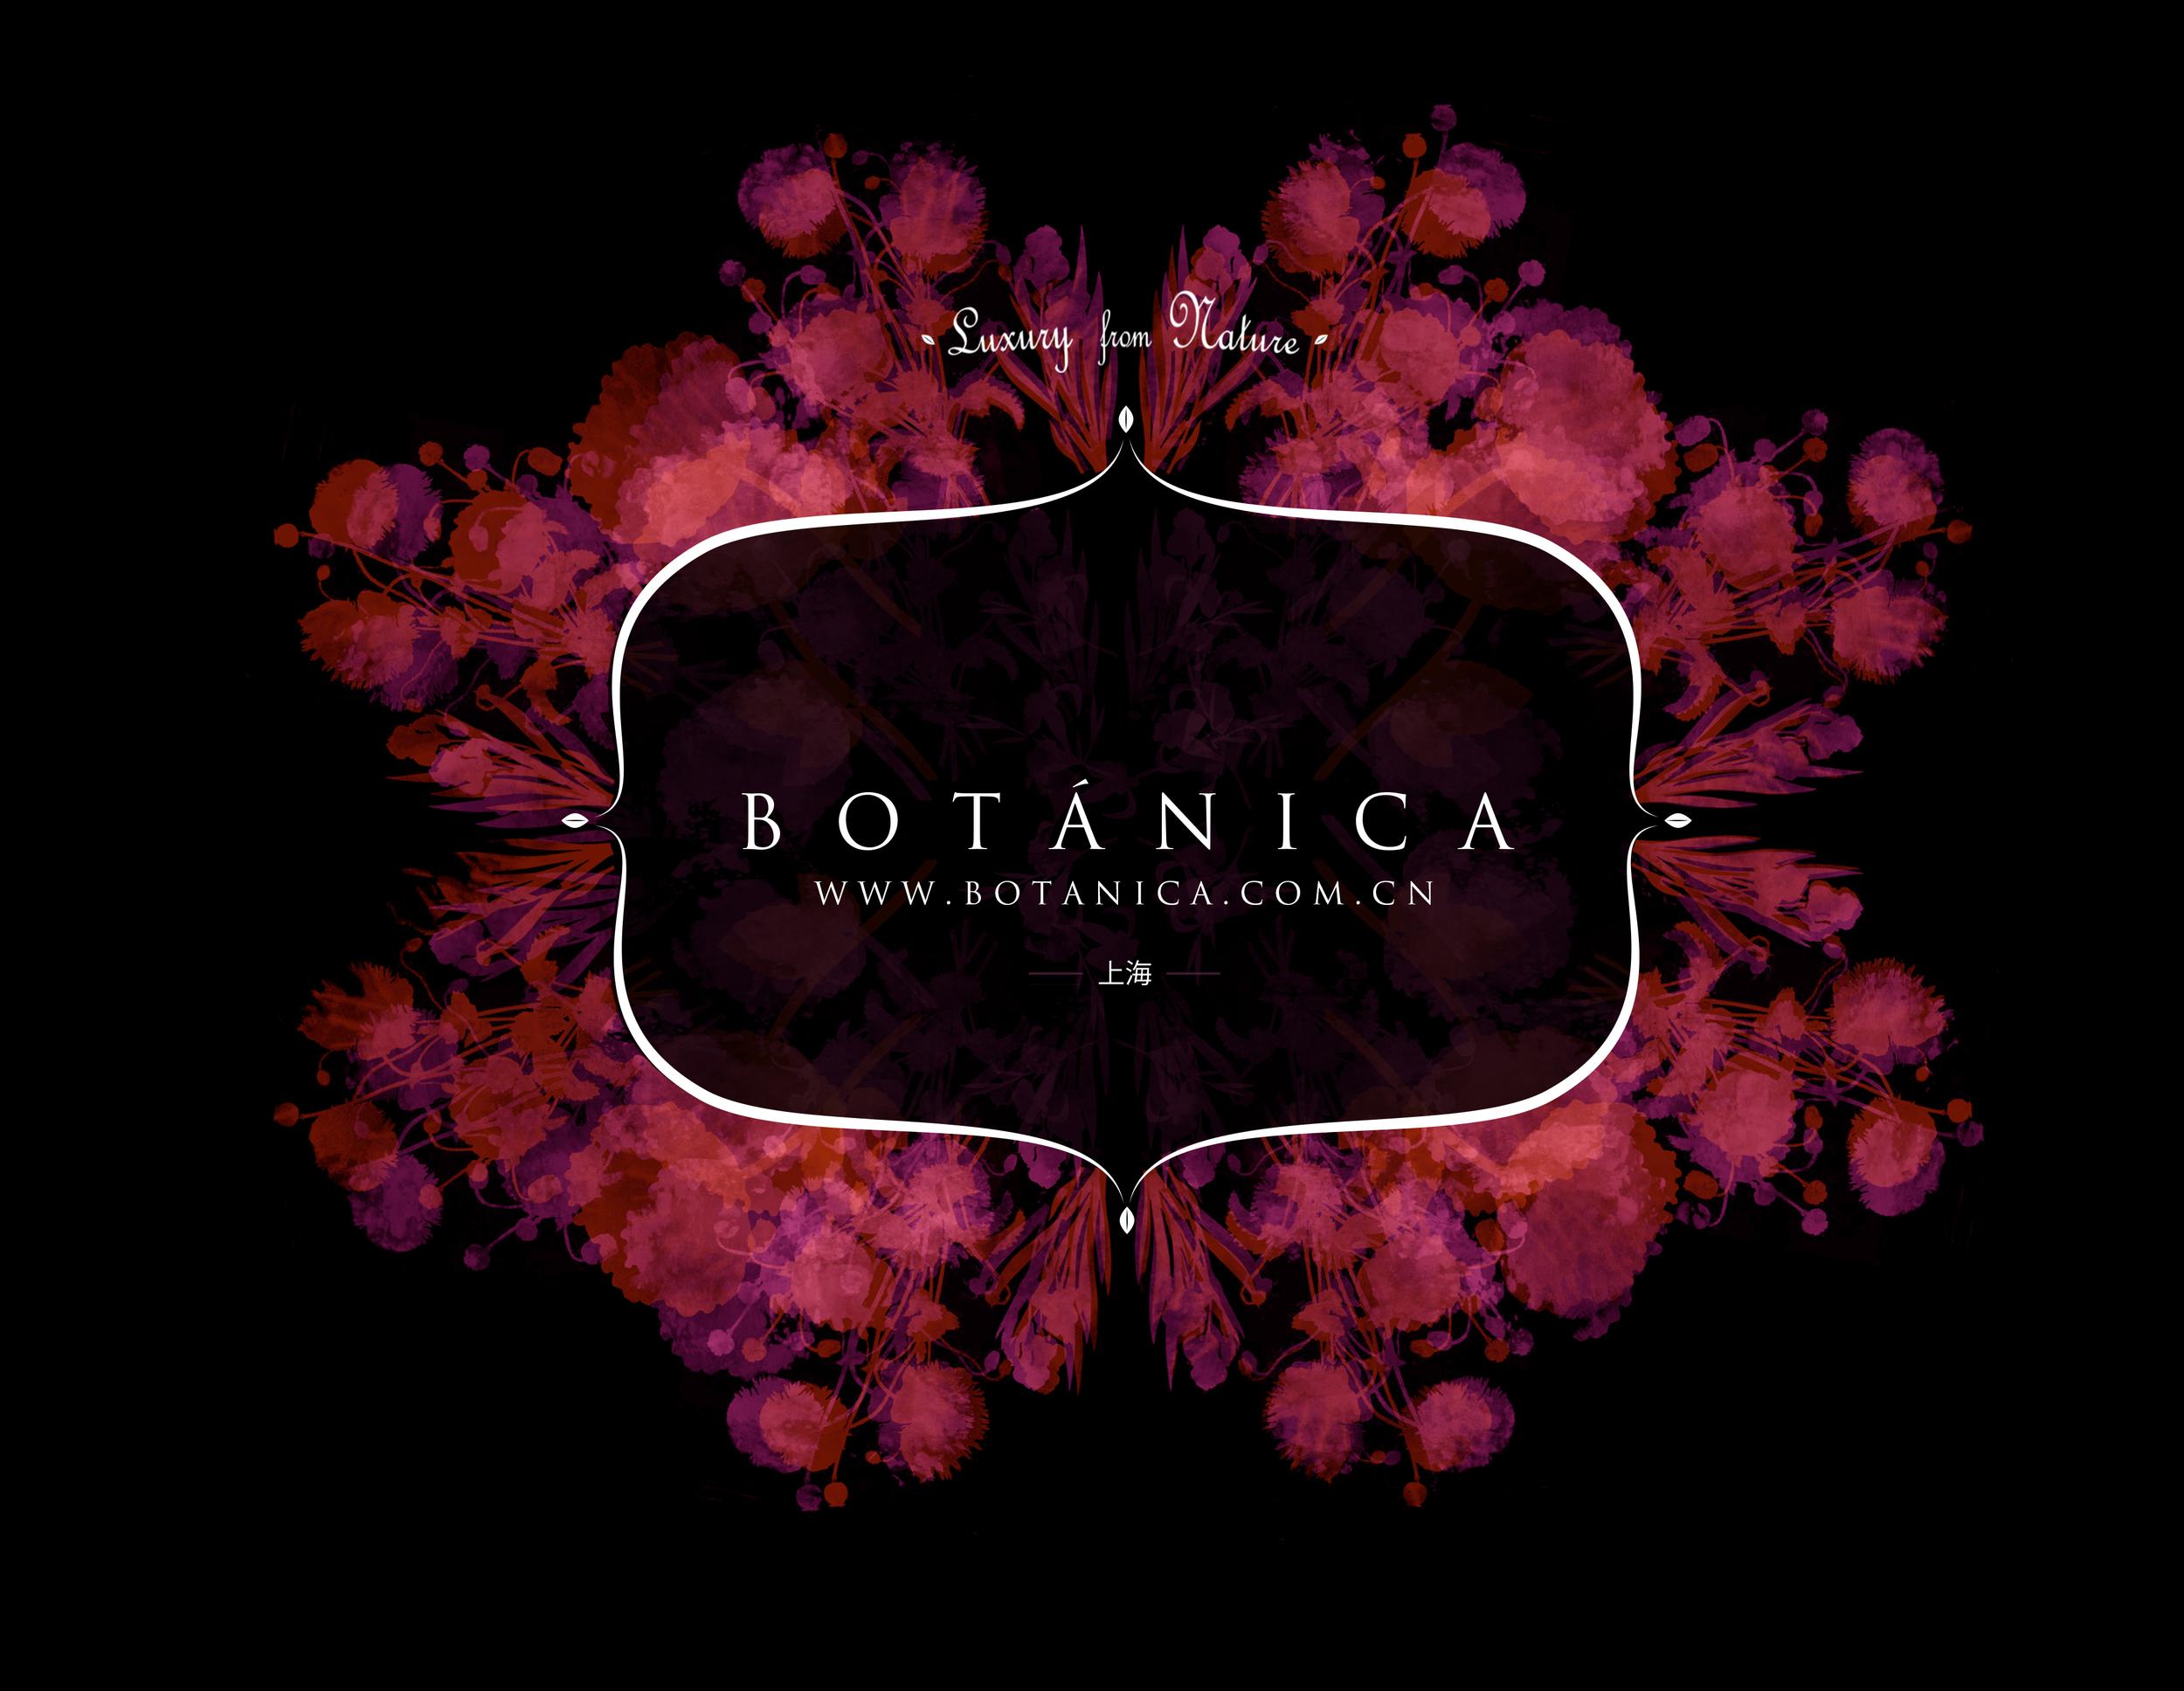 BotanicaAround.jpg